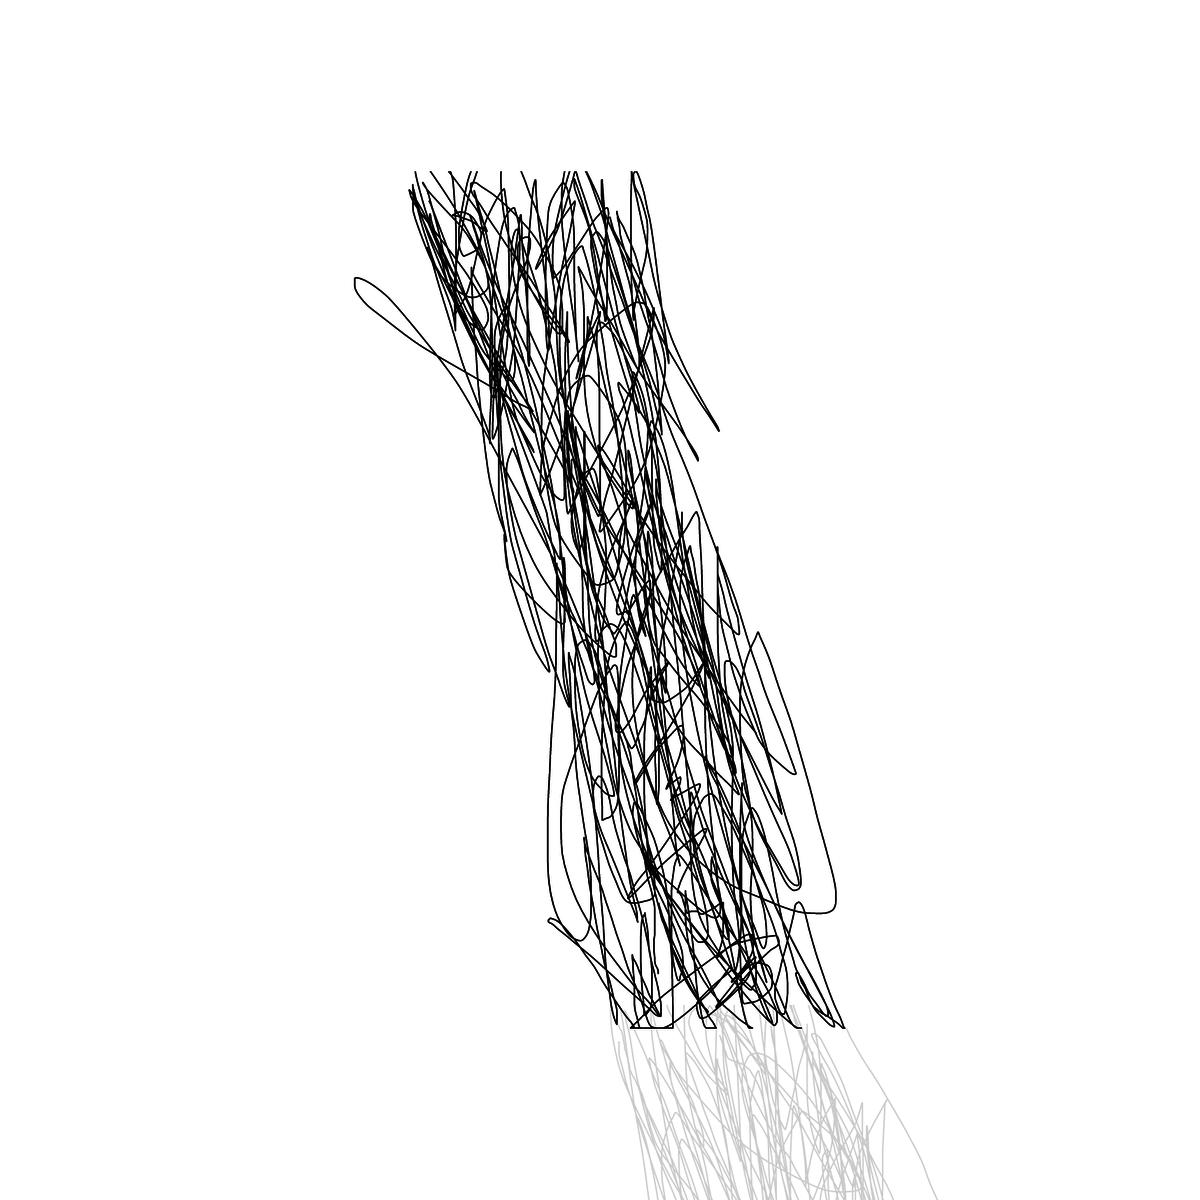 BAAAM drawing#6144 lat:51.3323554992675800lng: 12.3623199462890620